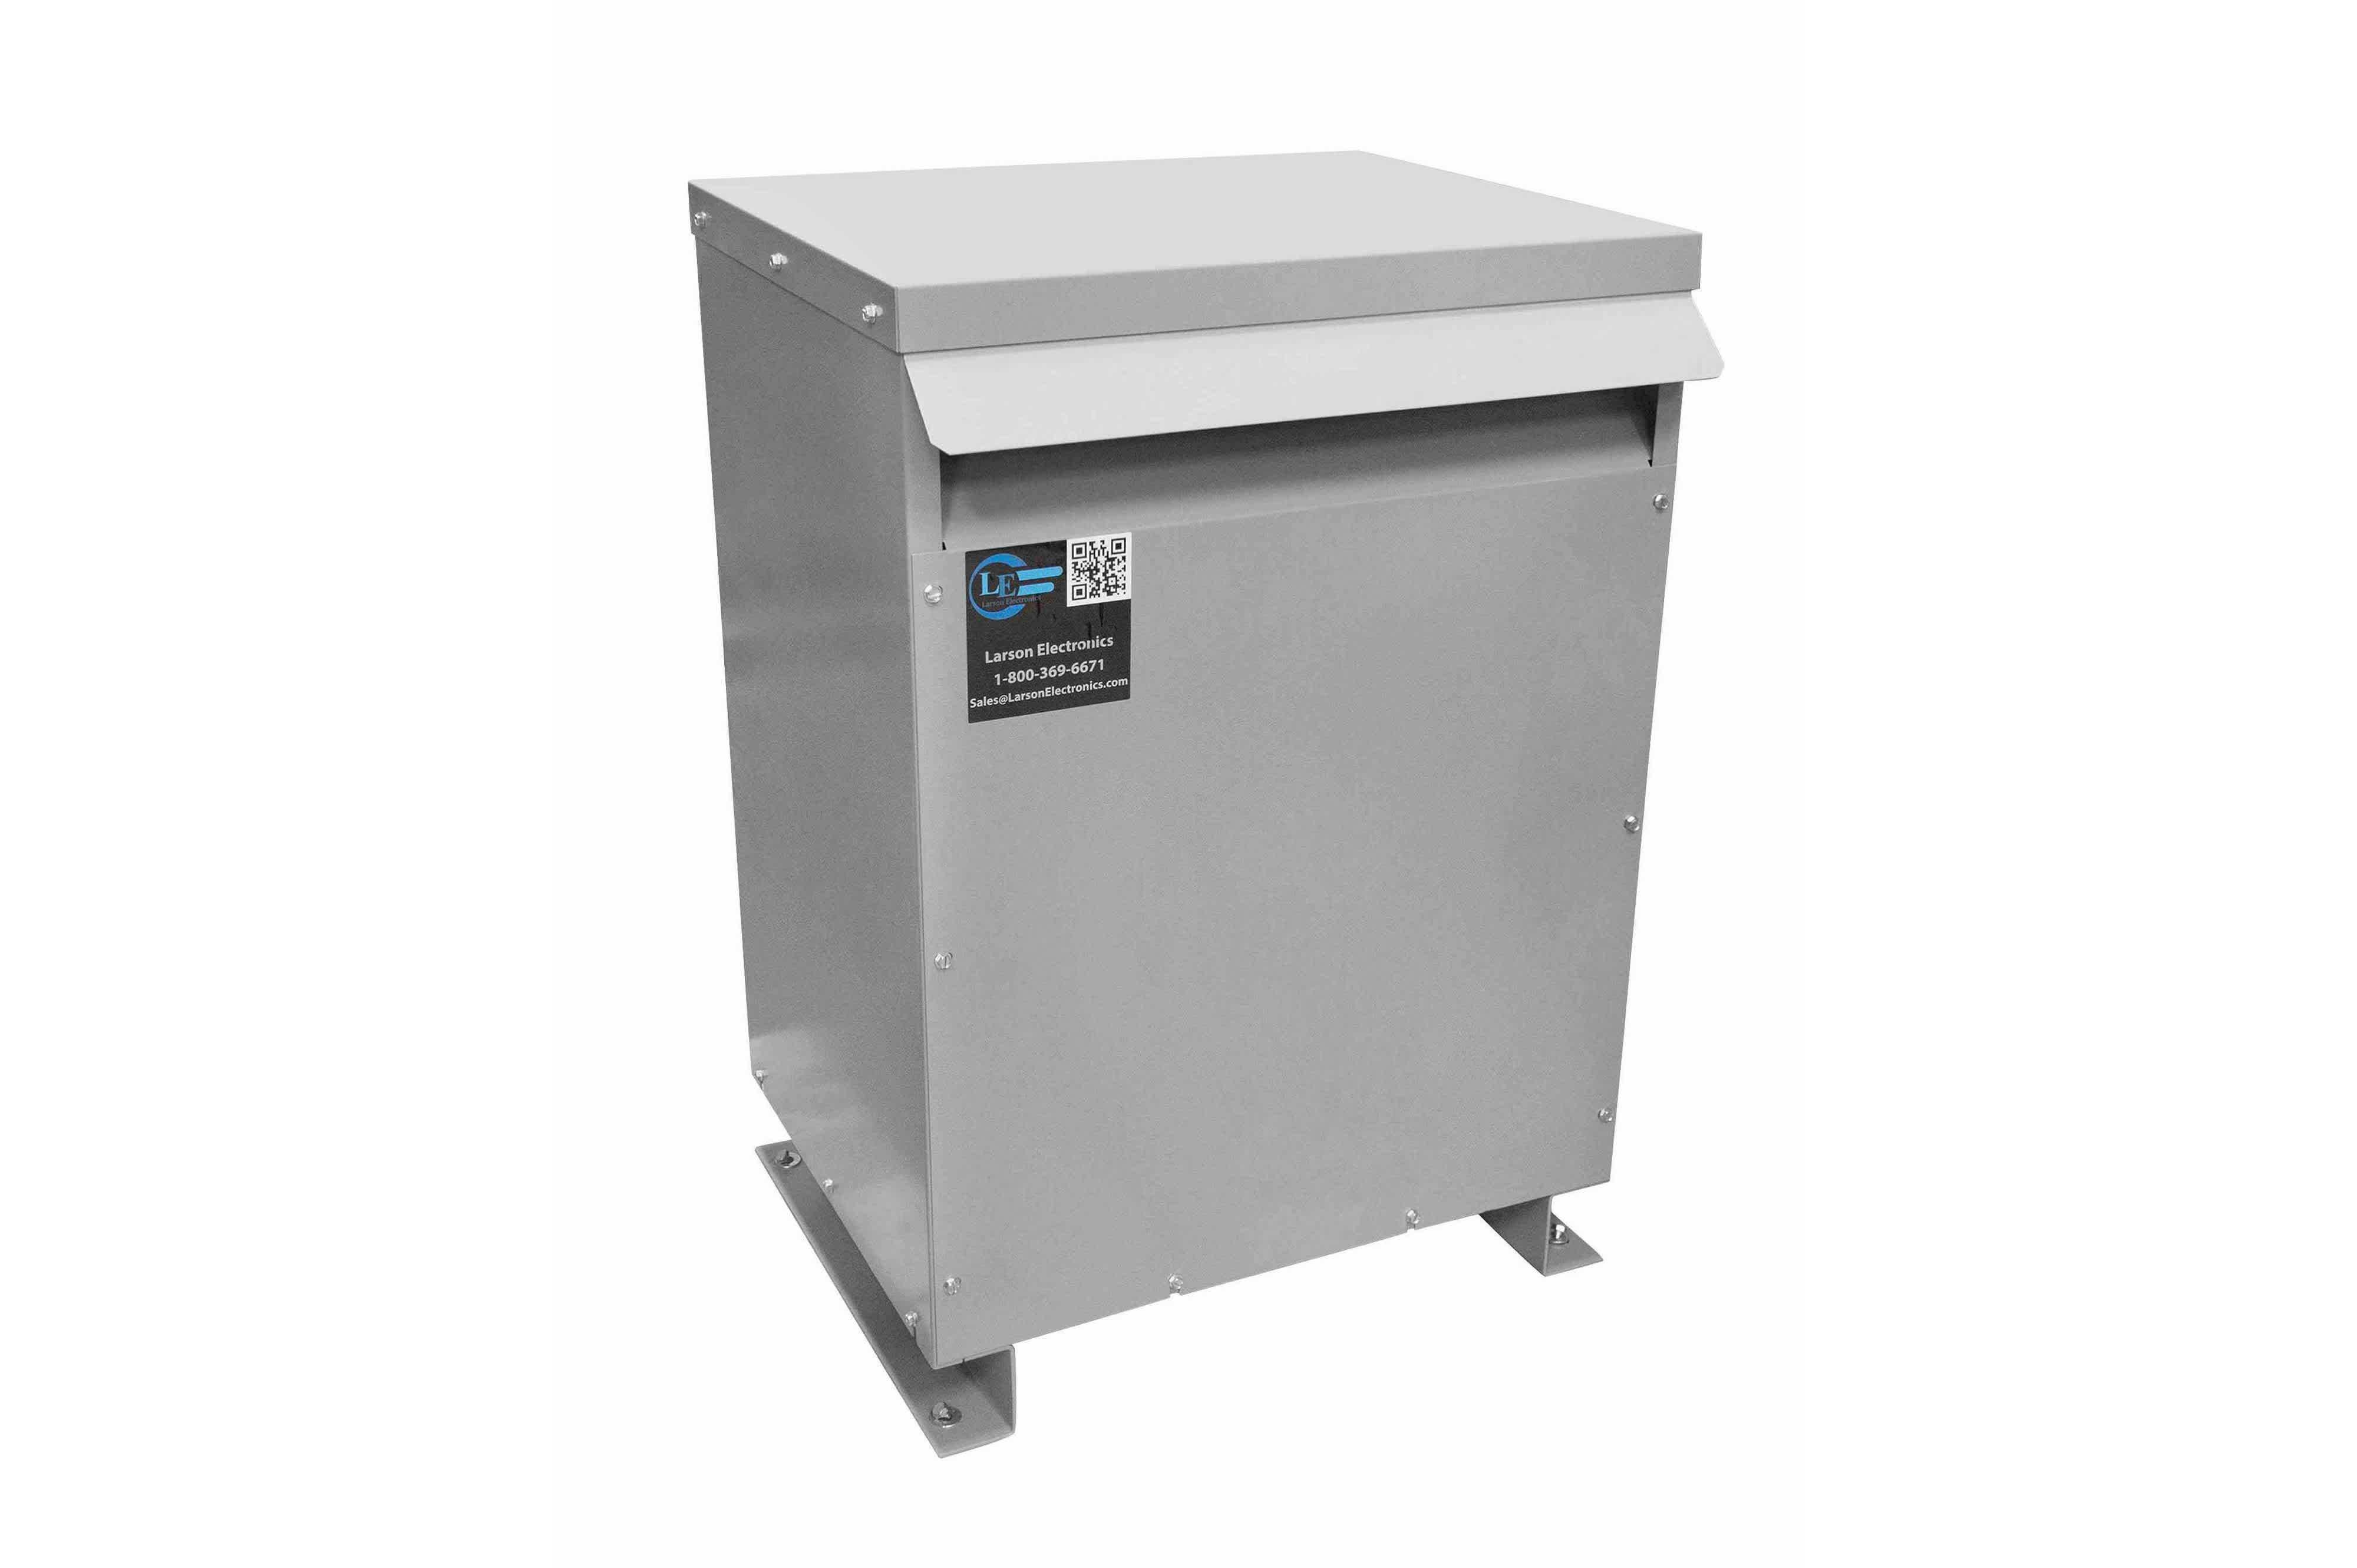 175 kVA 3PH Isolation Transformer, 208V Wye Primary, 240V/120 Delta Secondary, N3R, Ventilated, 60 Hz